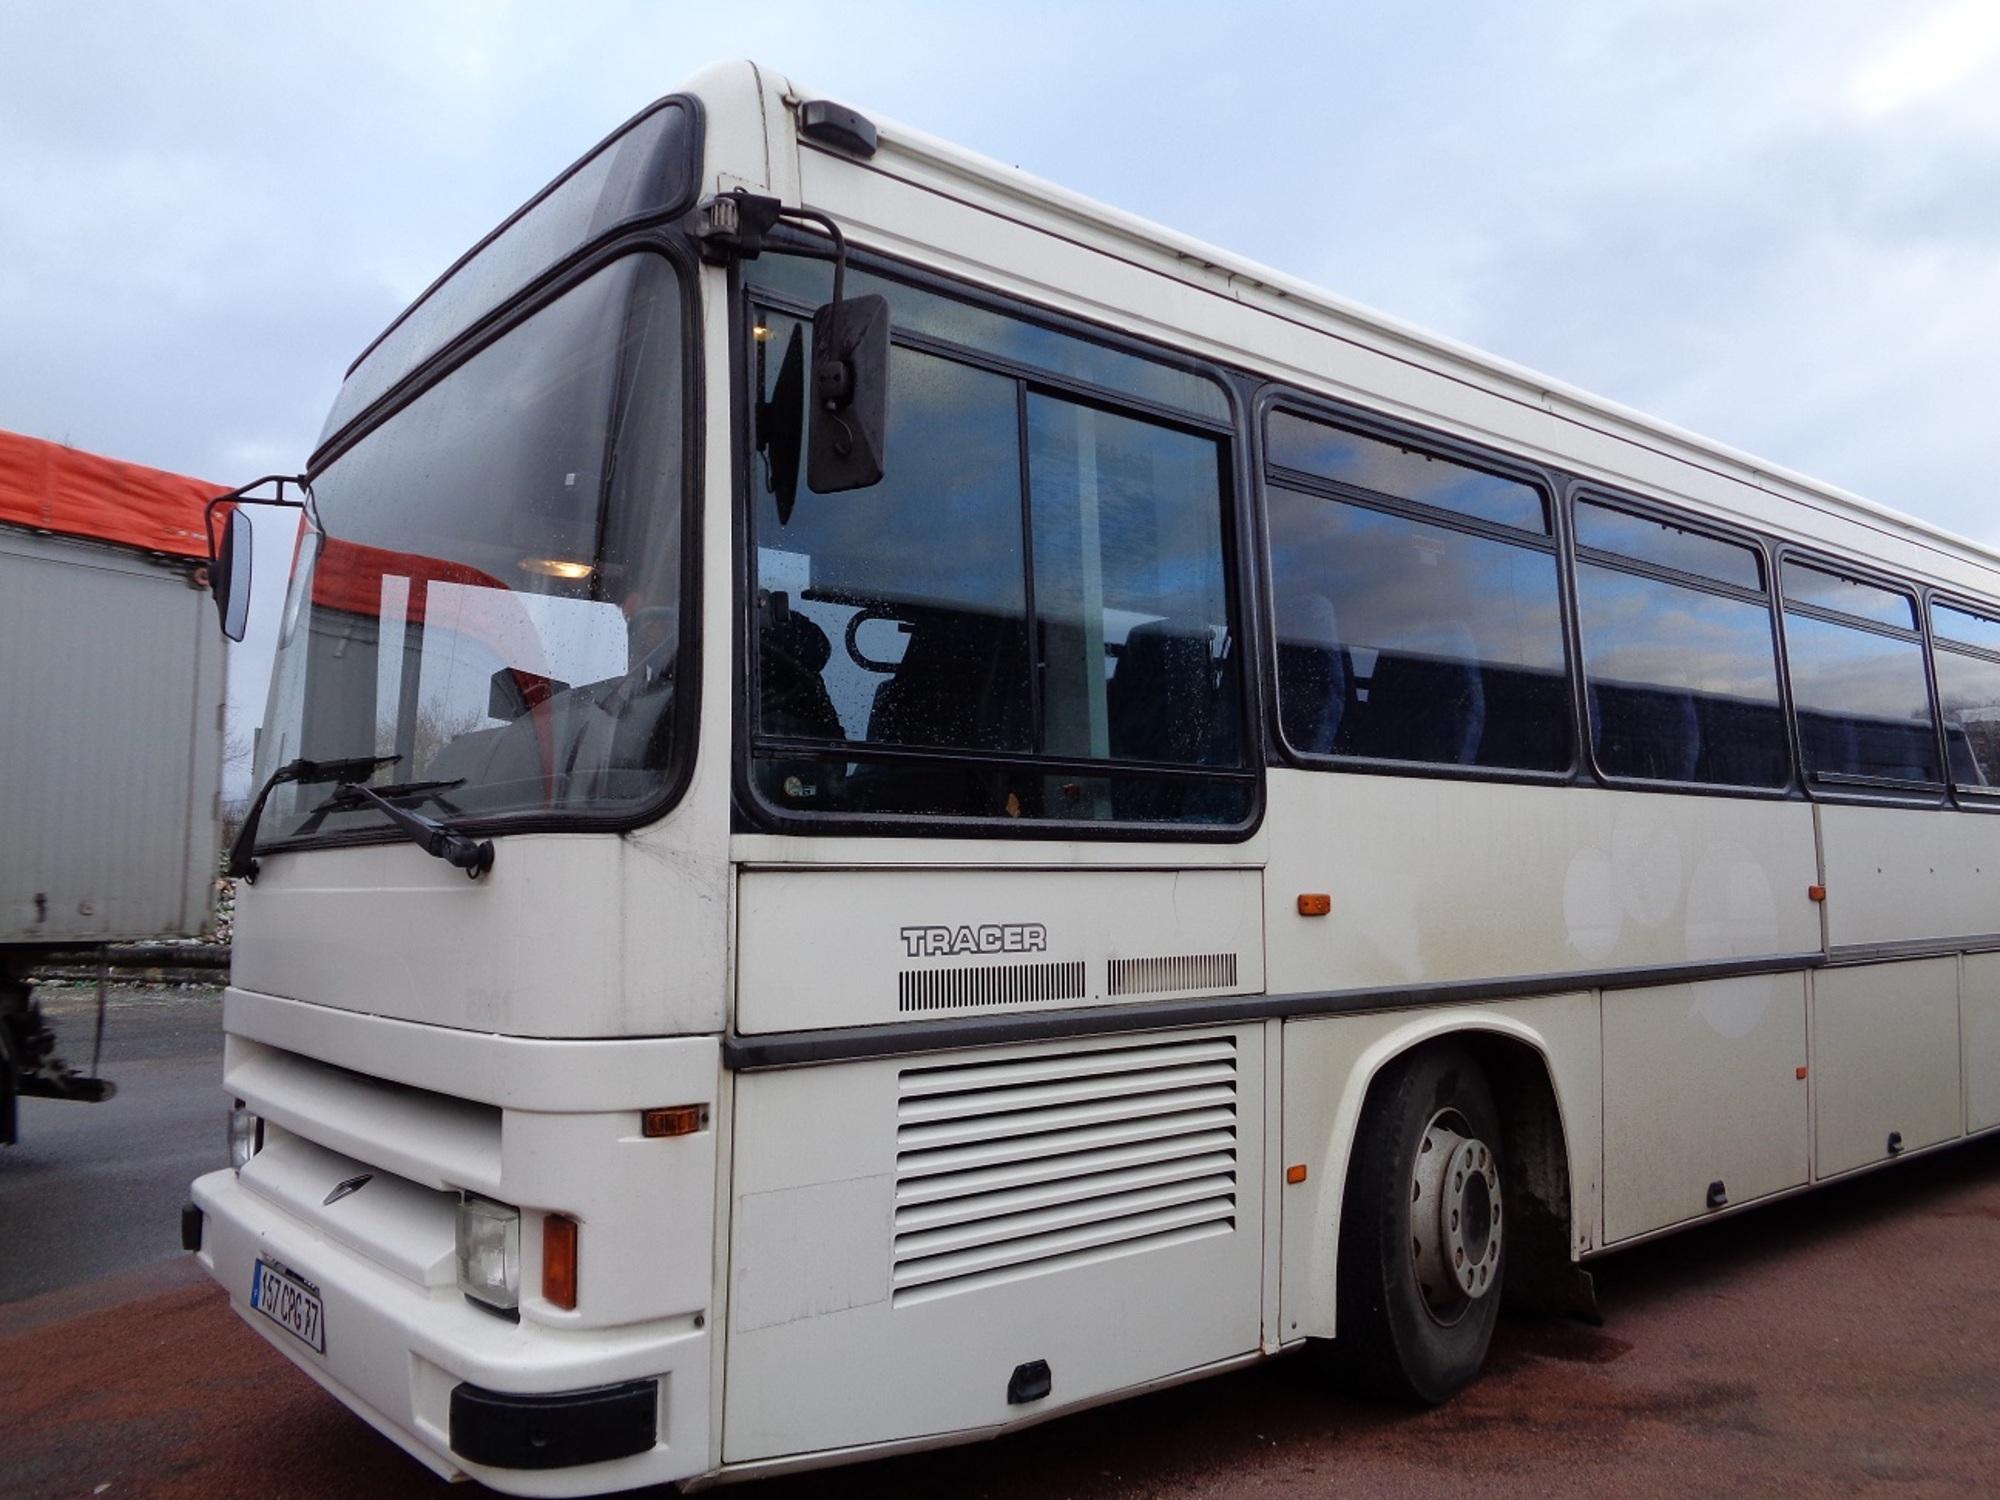 renault tracer 19705 car bus d 39 occasion aux ench res agorastore. Black Bedroom Furniture Sets. Home Design Ideas